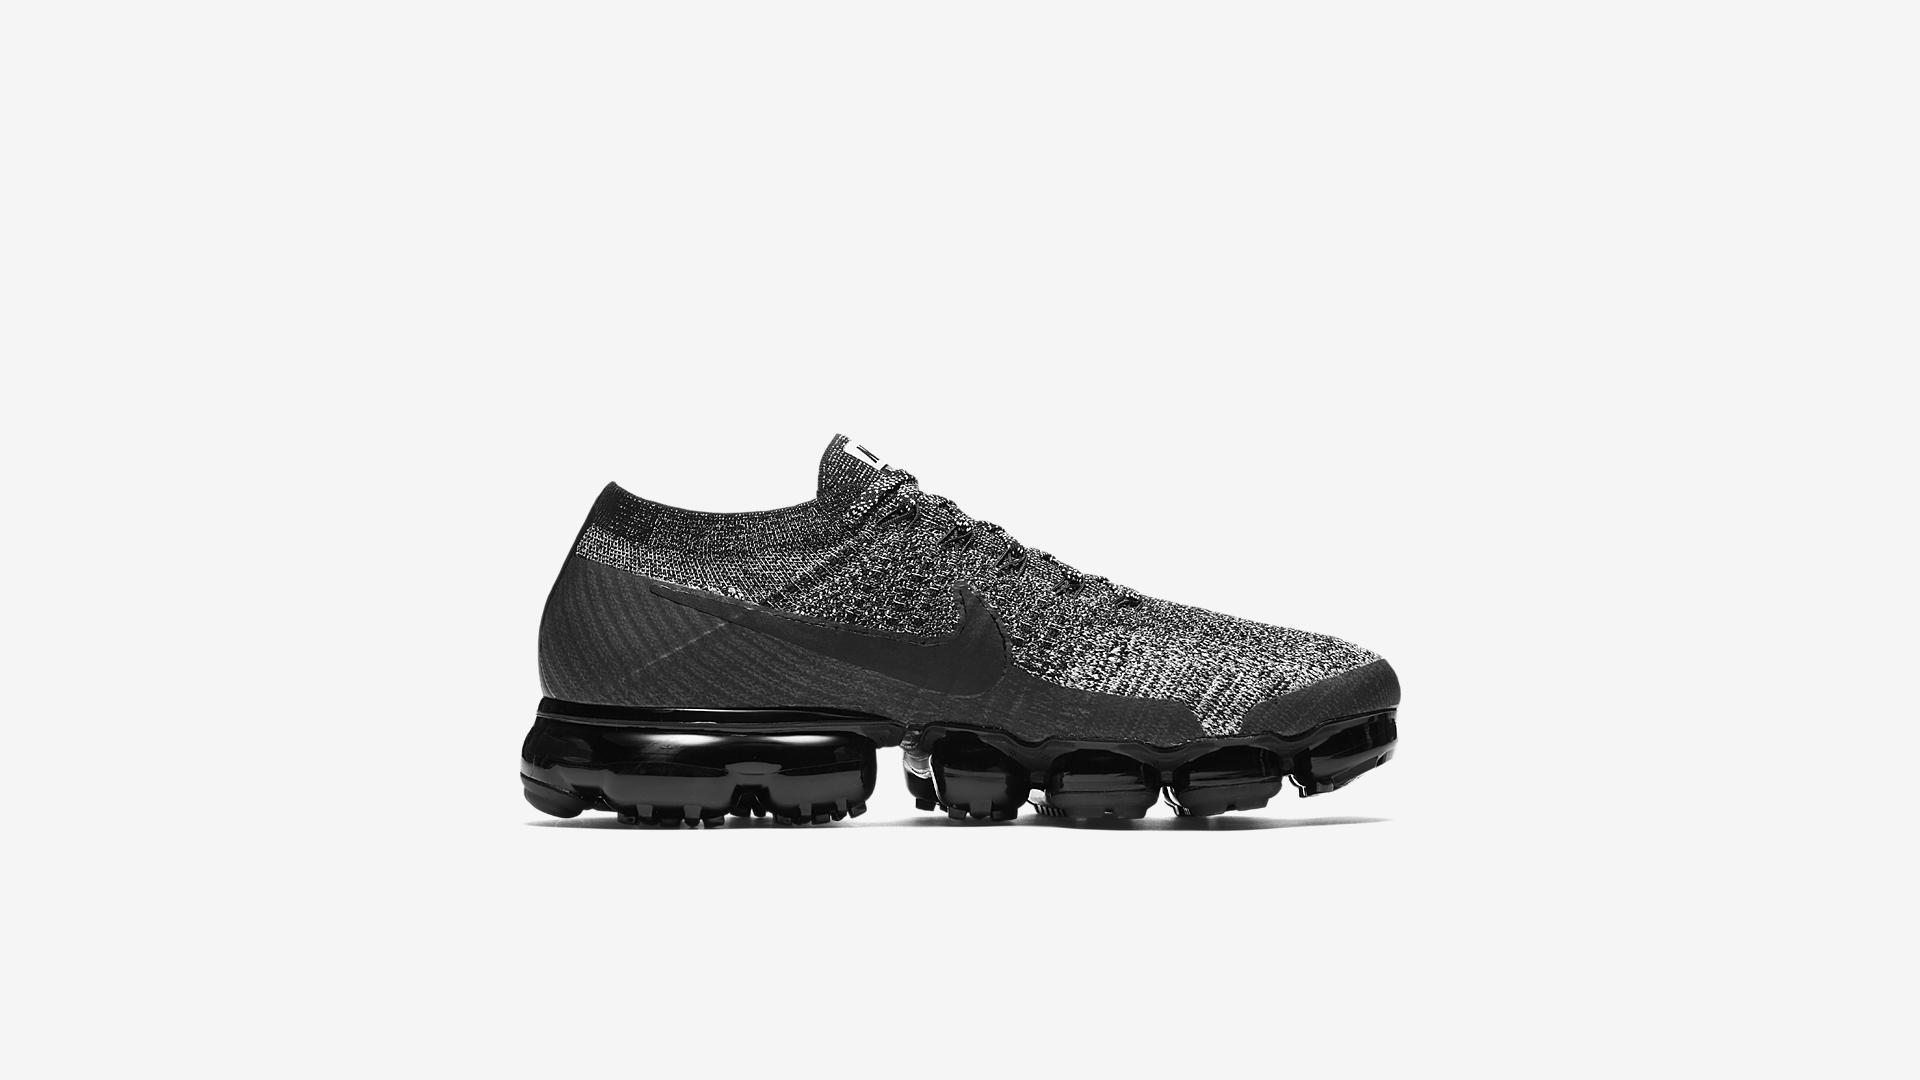 849558 041 Nike Air VaporMax Oreo 4